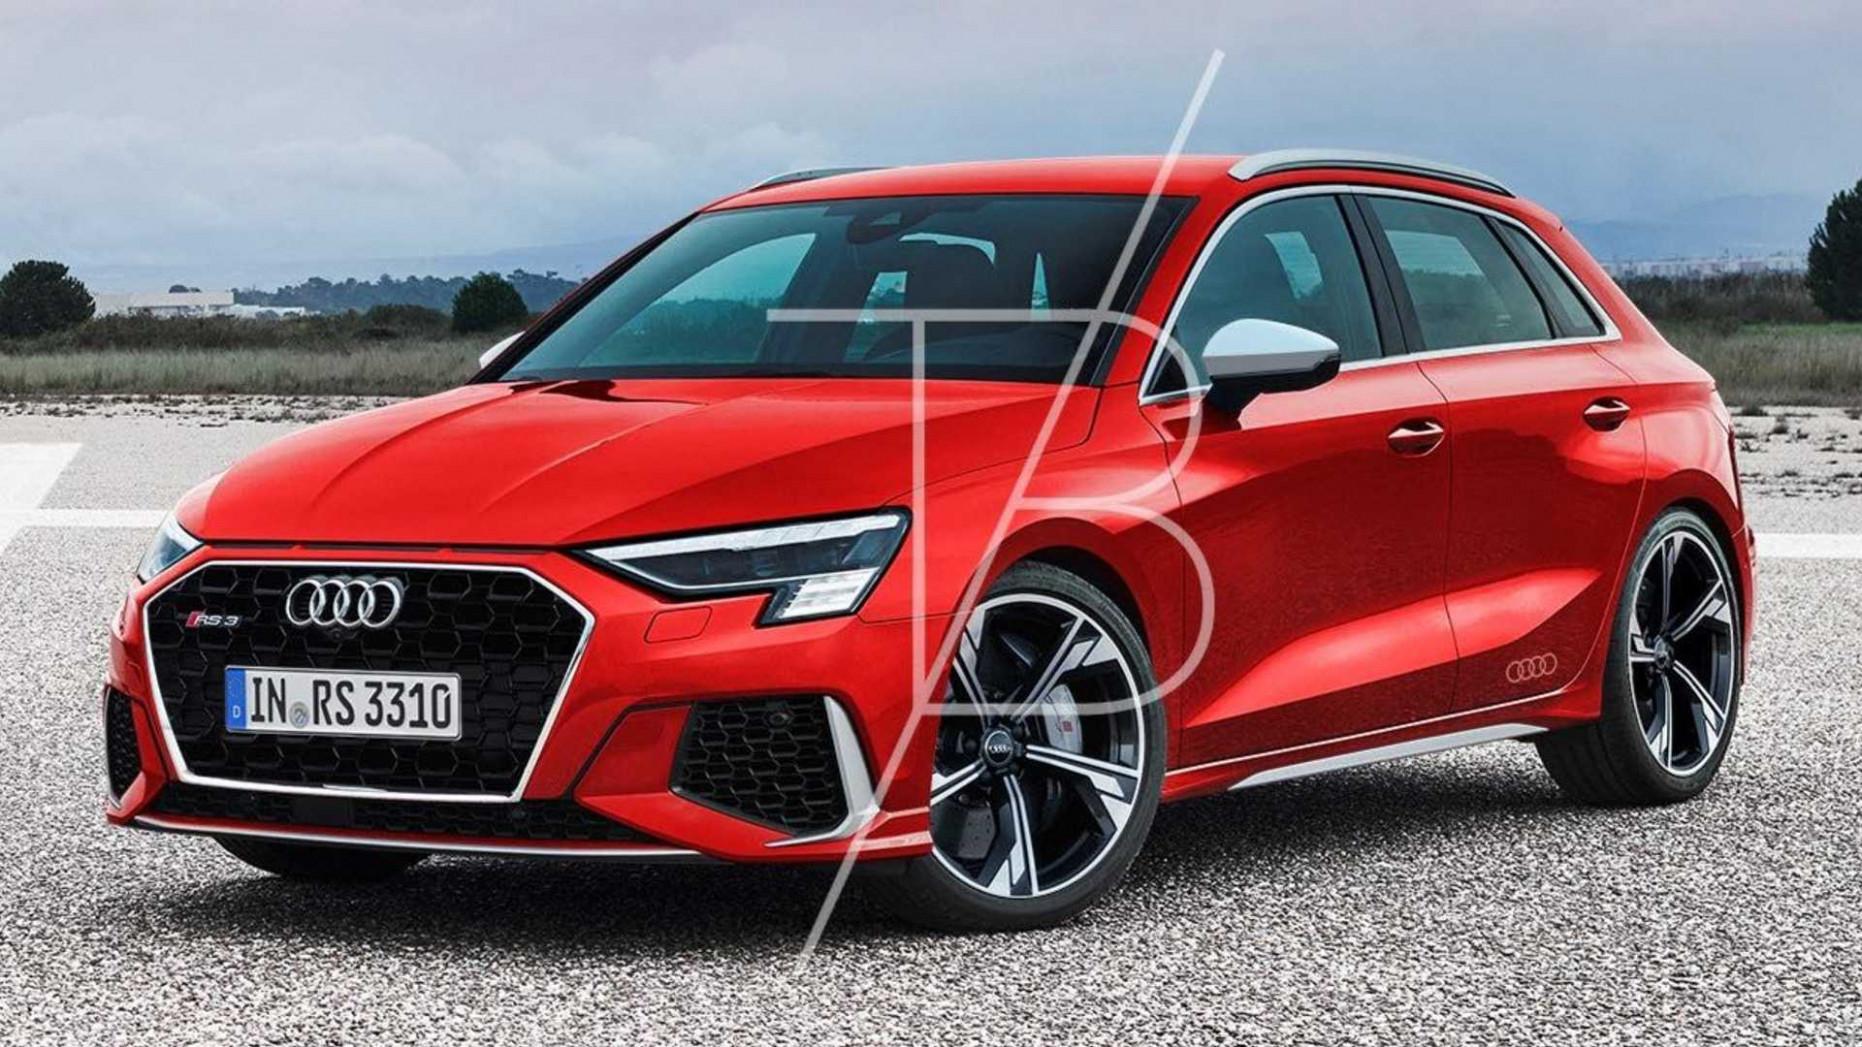 New Concept 2022 Audi Rs4 Usa